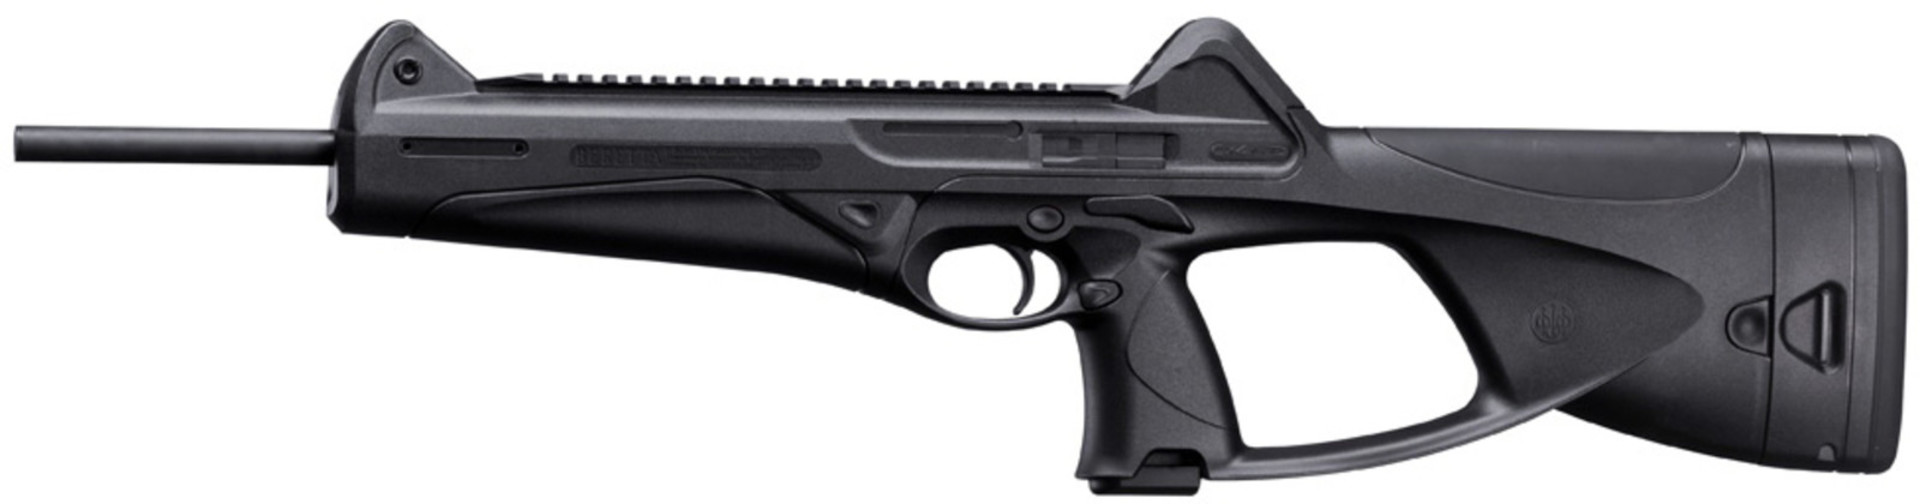 751a26662 Vzduchová puška Beretta Cx4 Storm | Colosus.cz